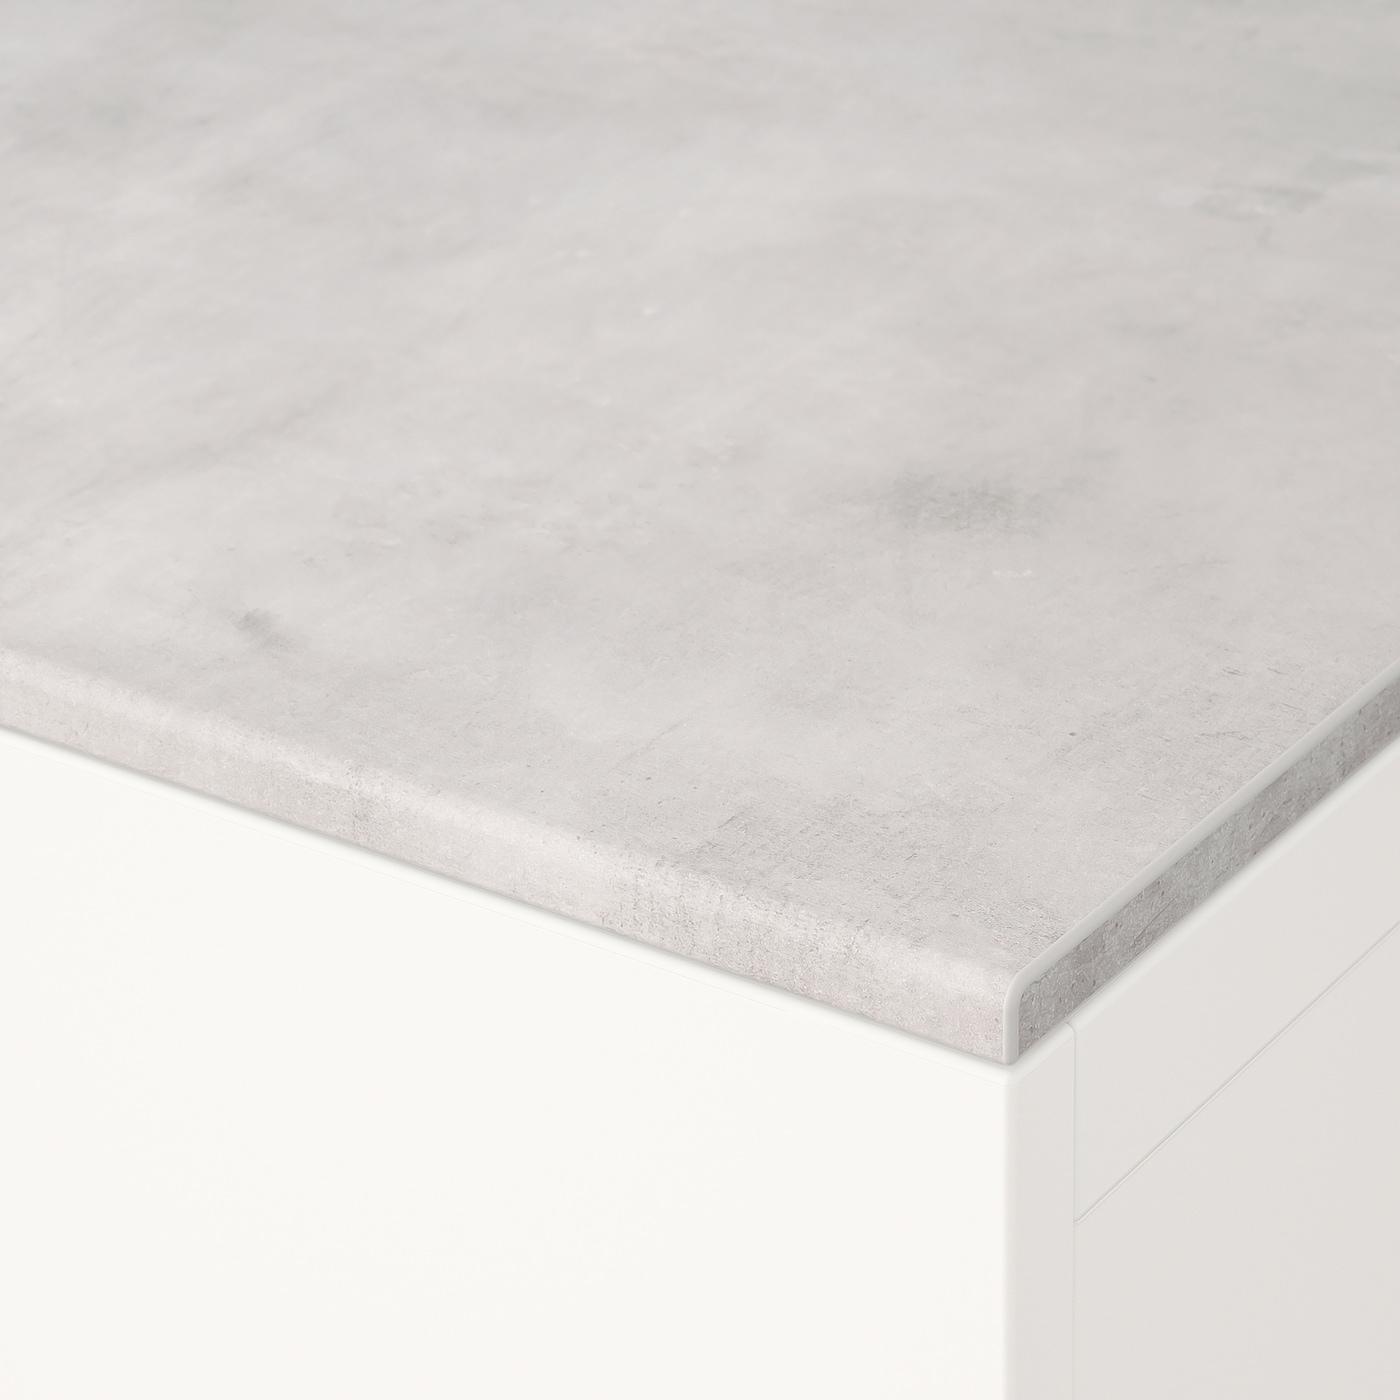 BESTÅ concrete effect, light grey, Top